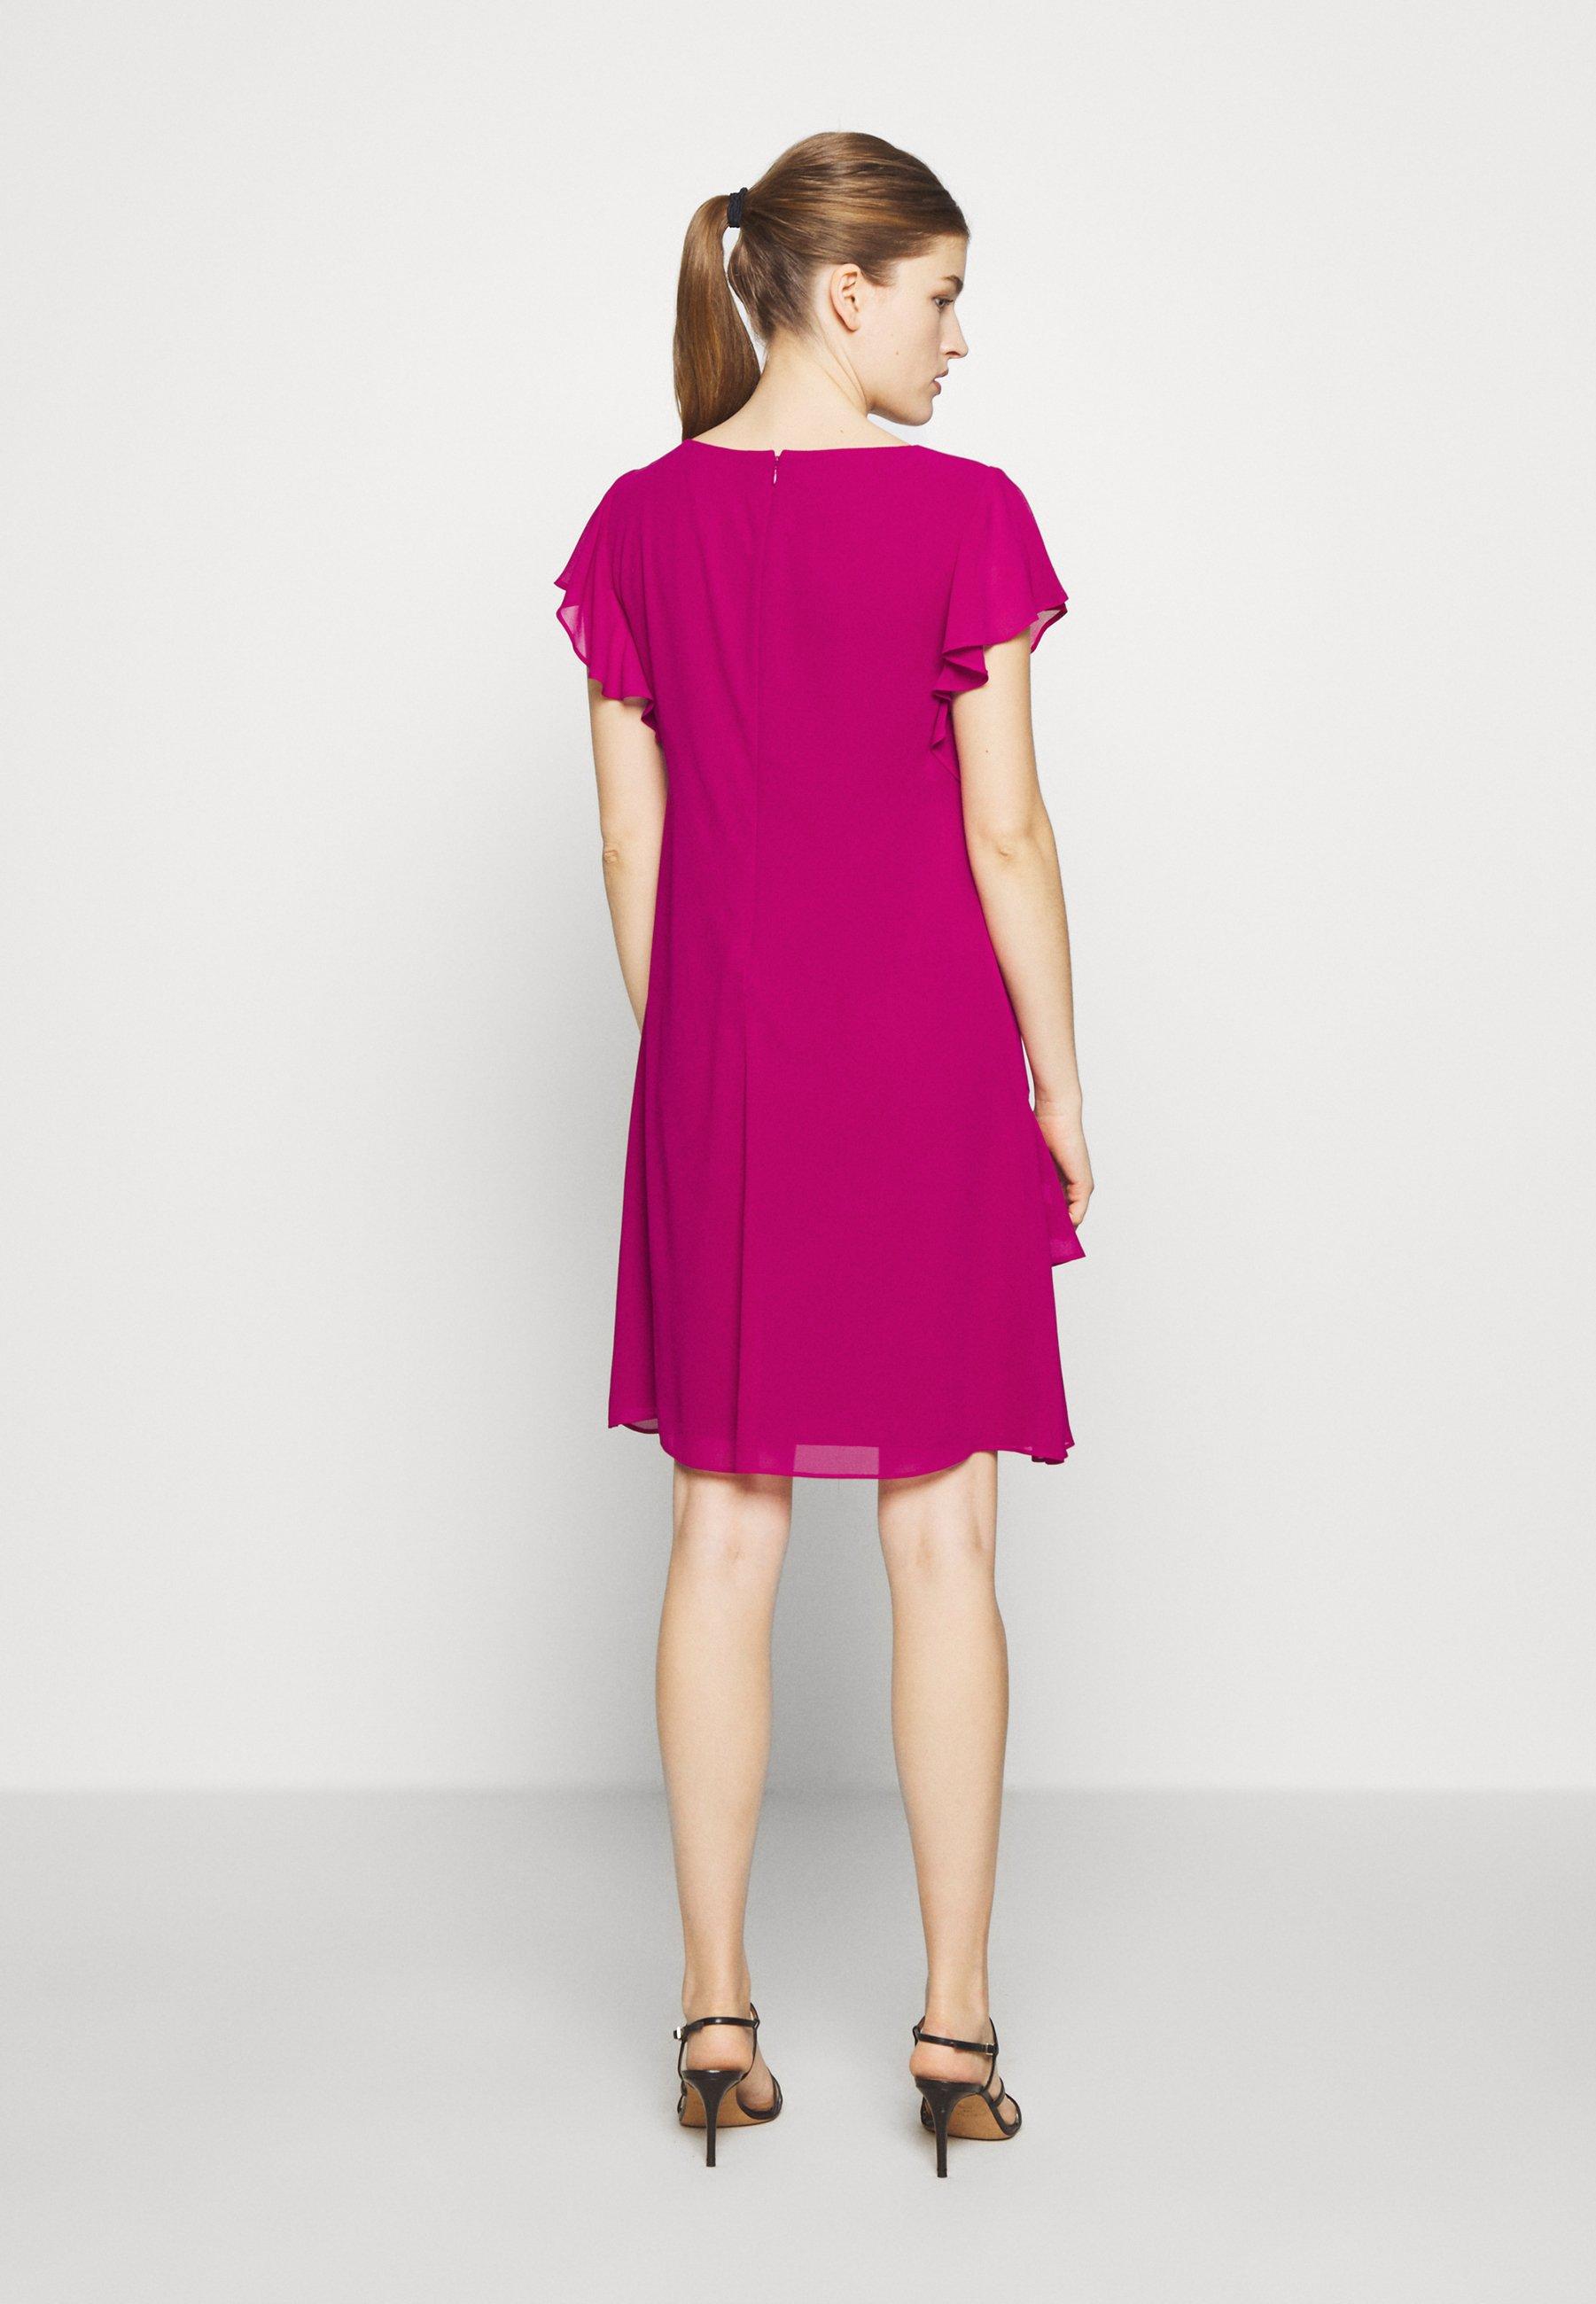 Lauren Ralph Classic Solid Dress - Vardagsklänning Bright Fuchsia